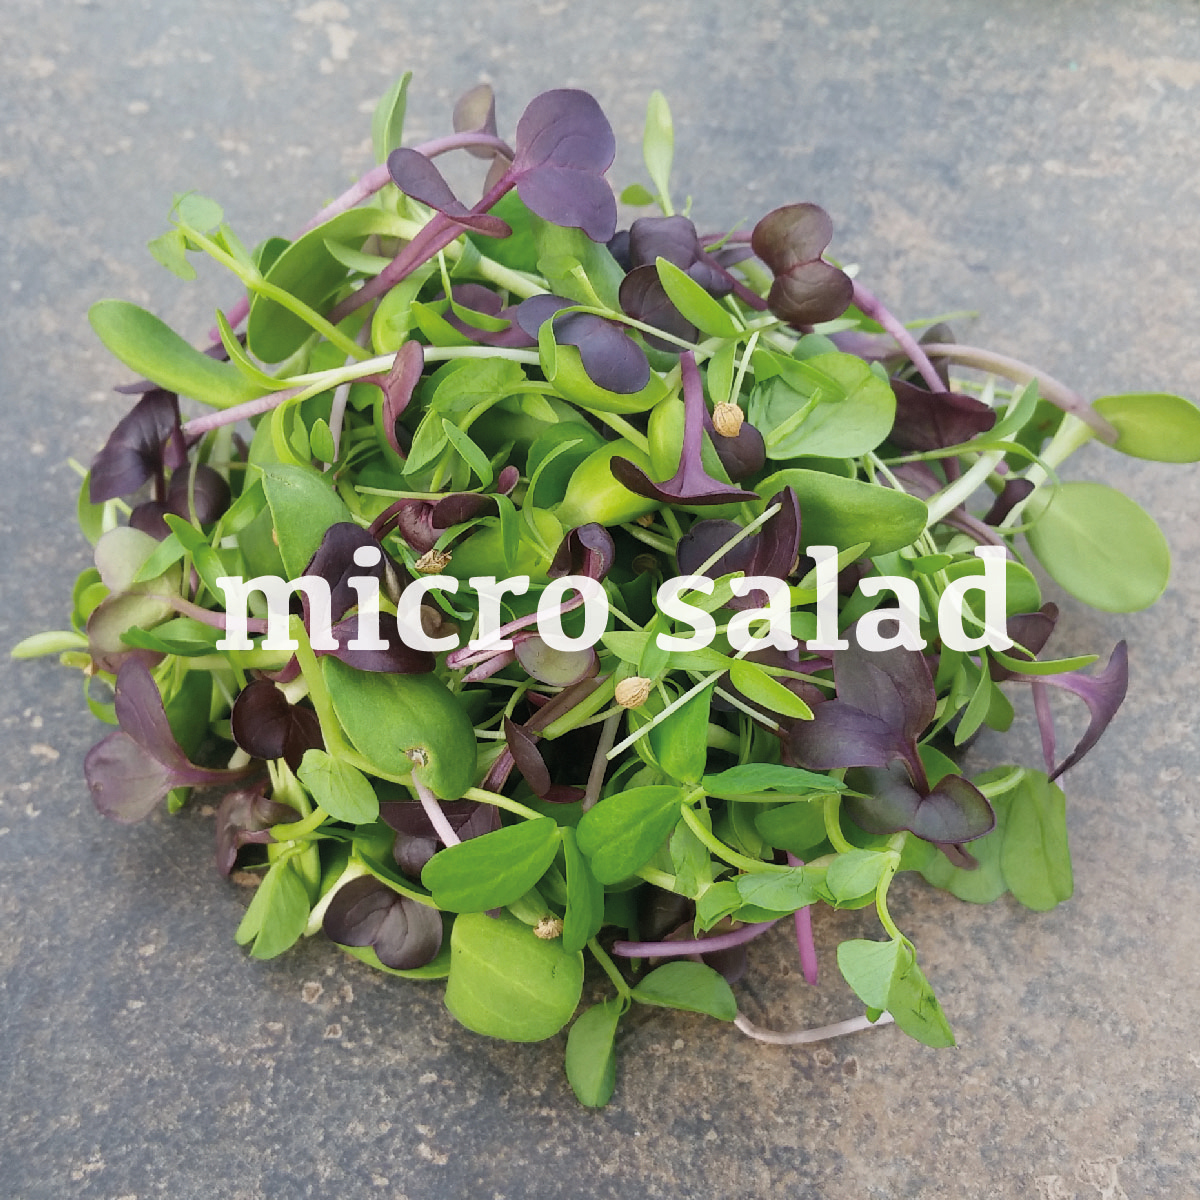 micro-salad.jpg